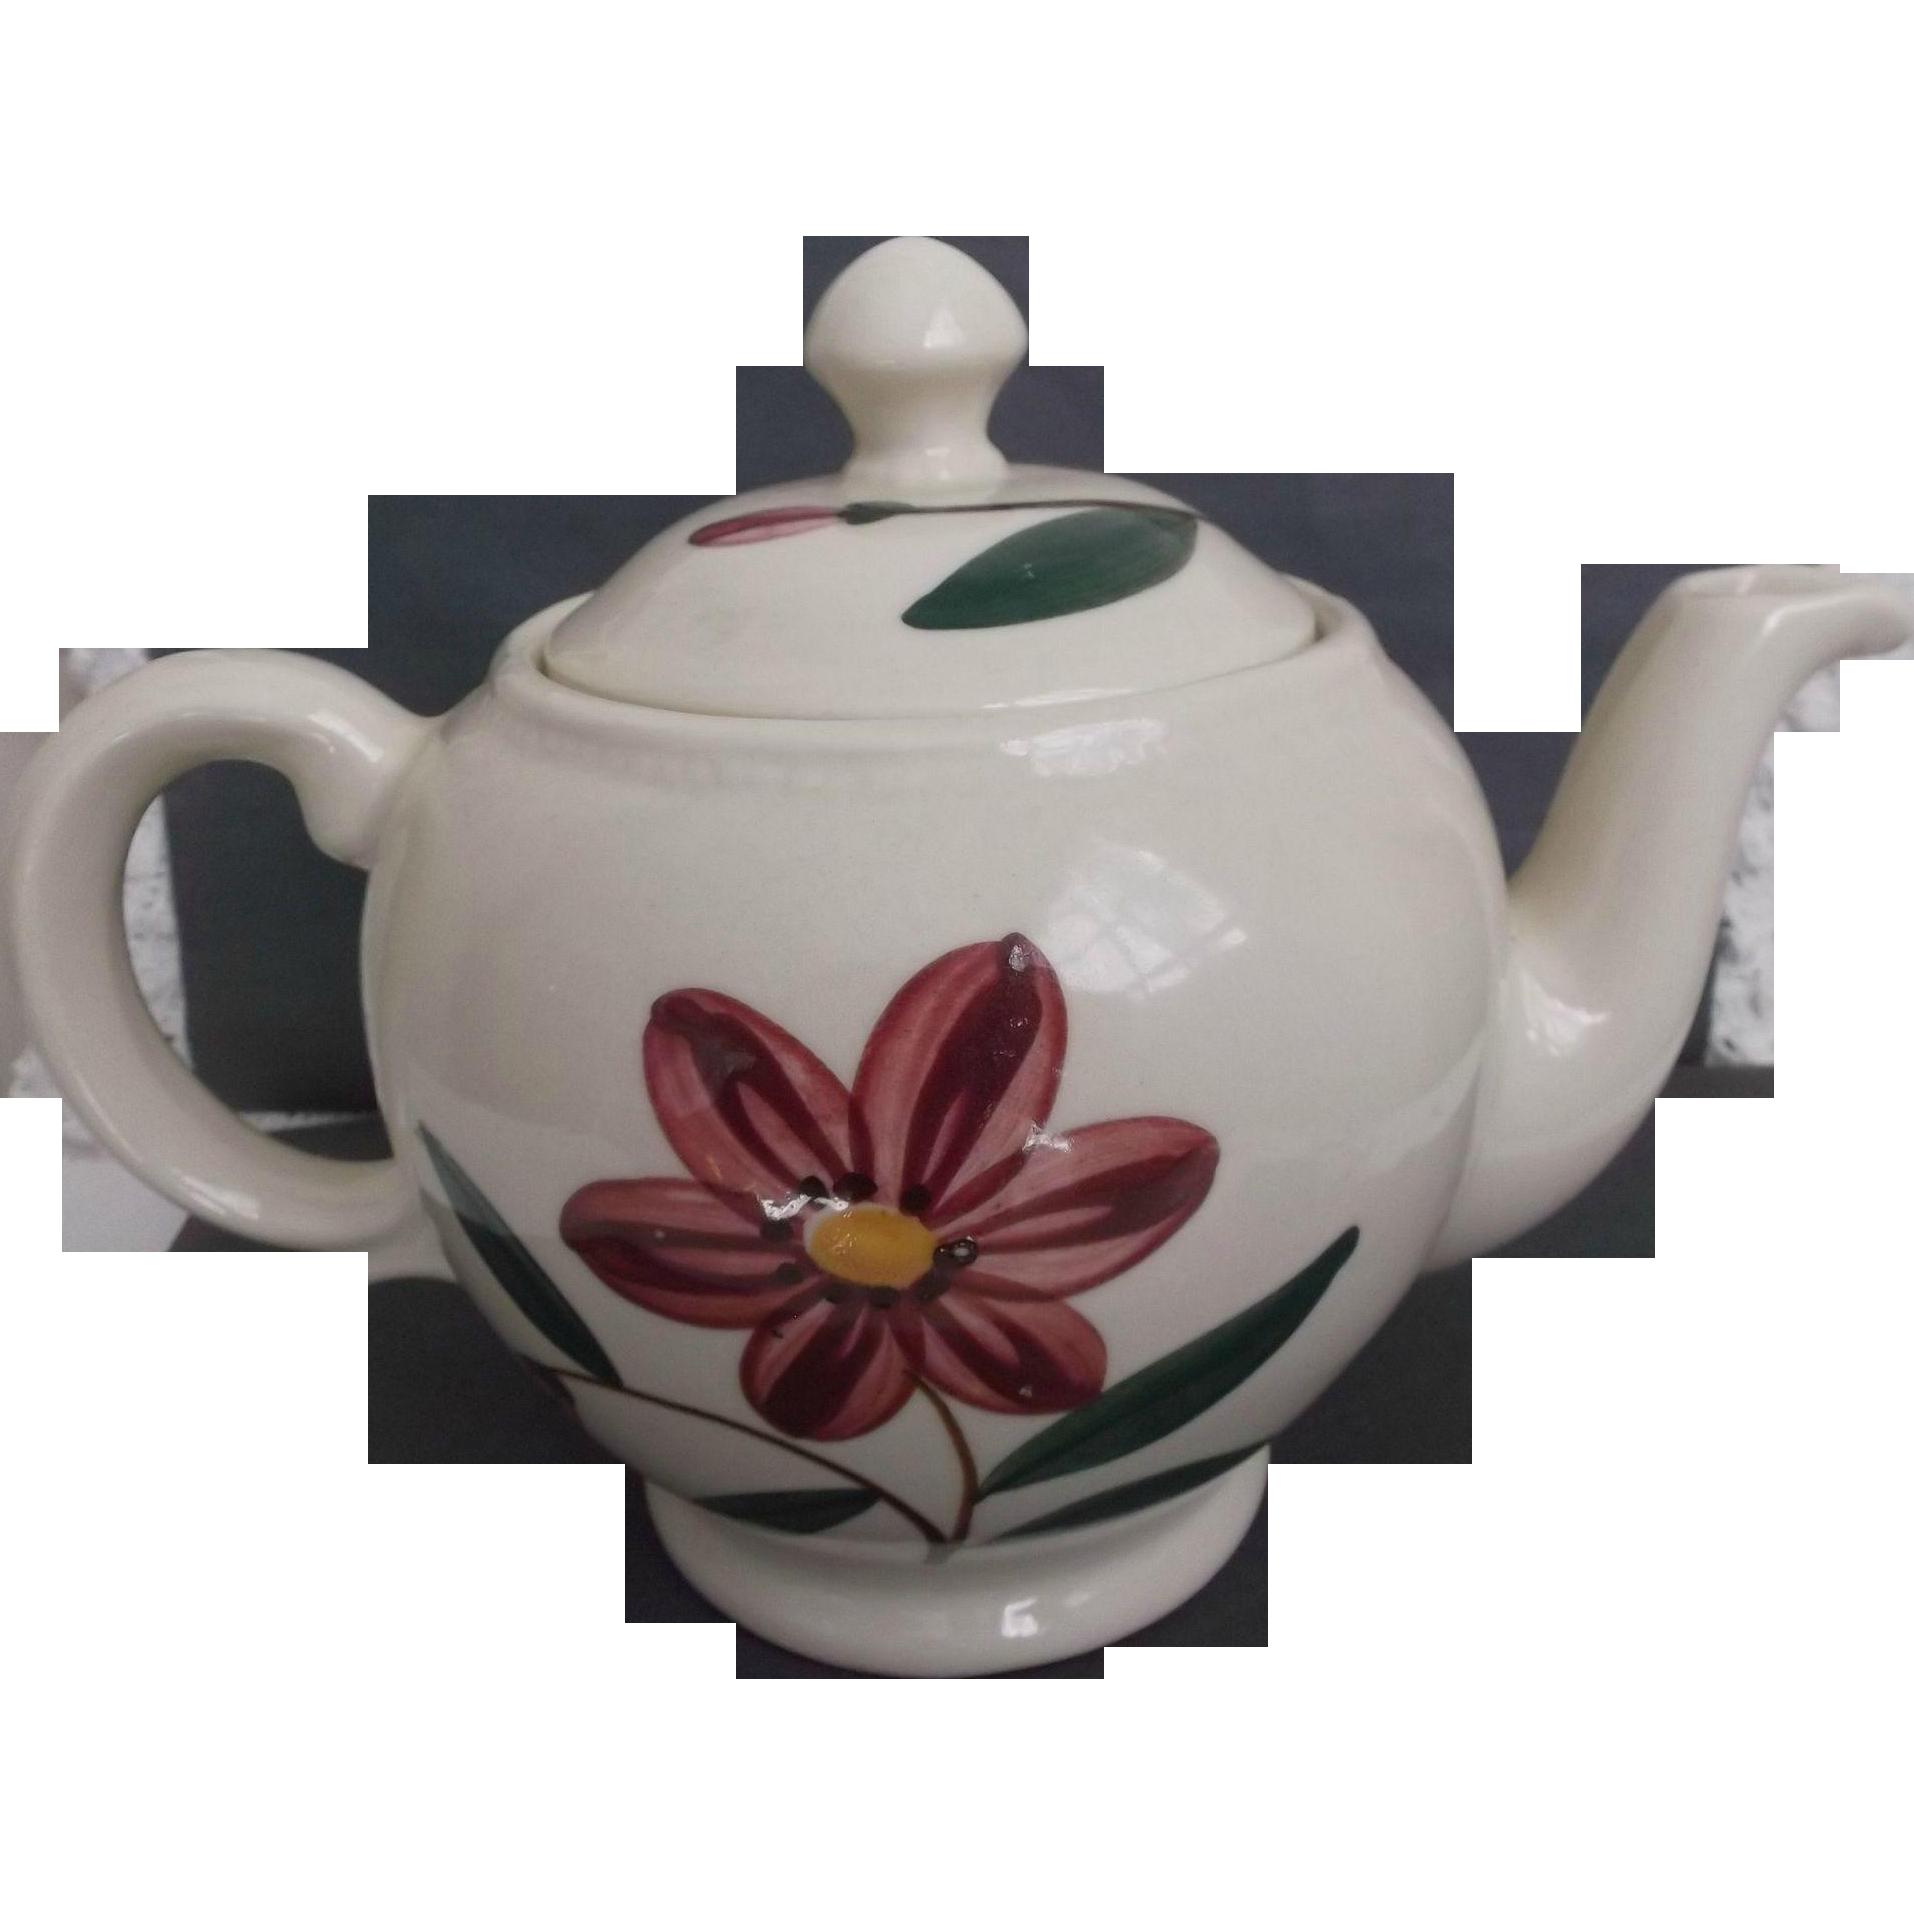 Vintage Shawnee U.S.A. Tea Pot with Pink Flower Green Leaves